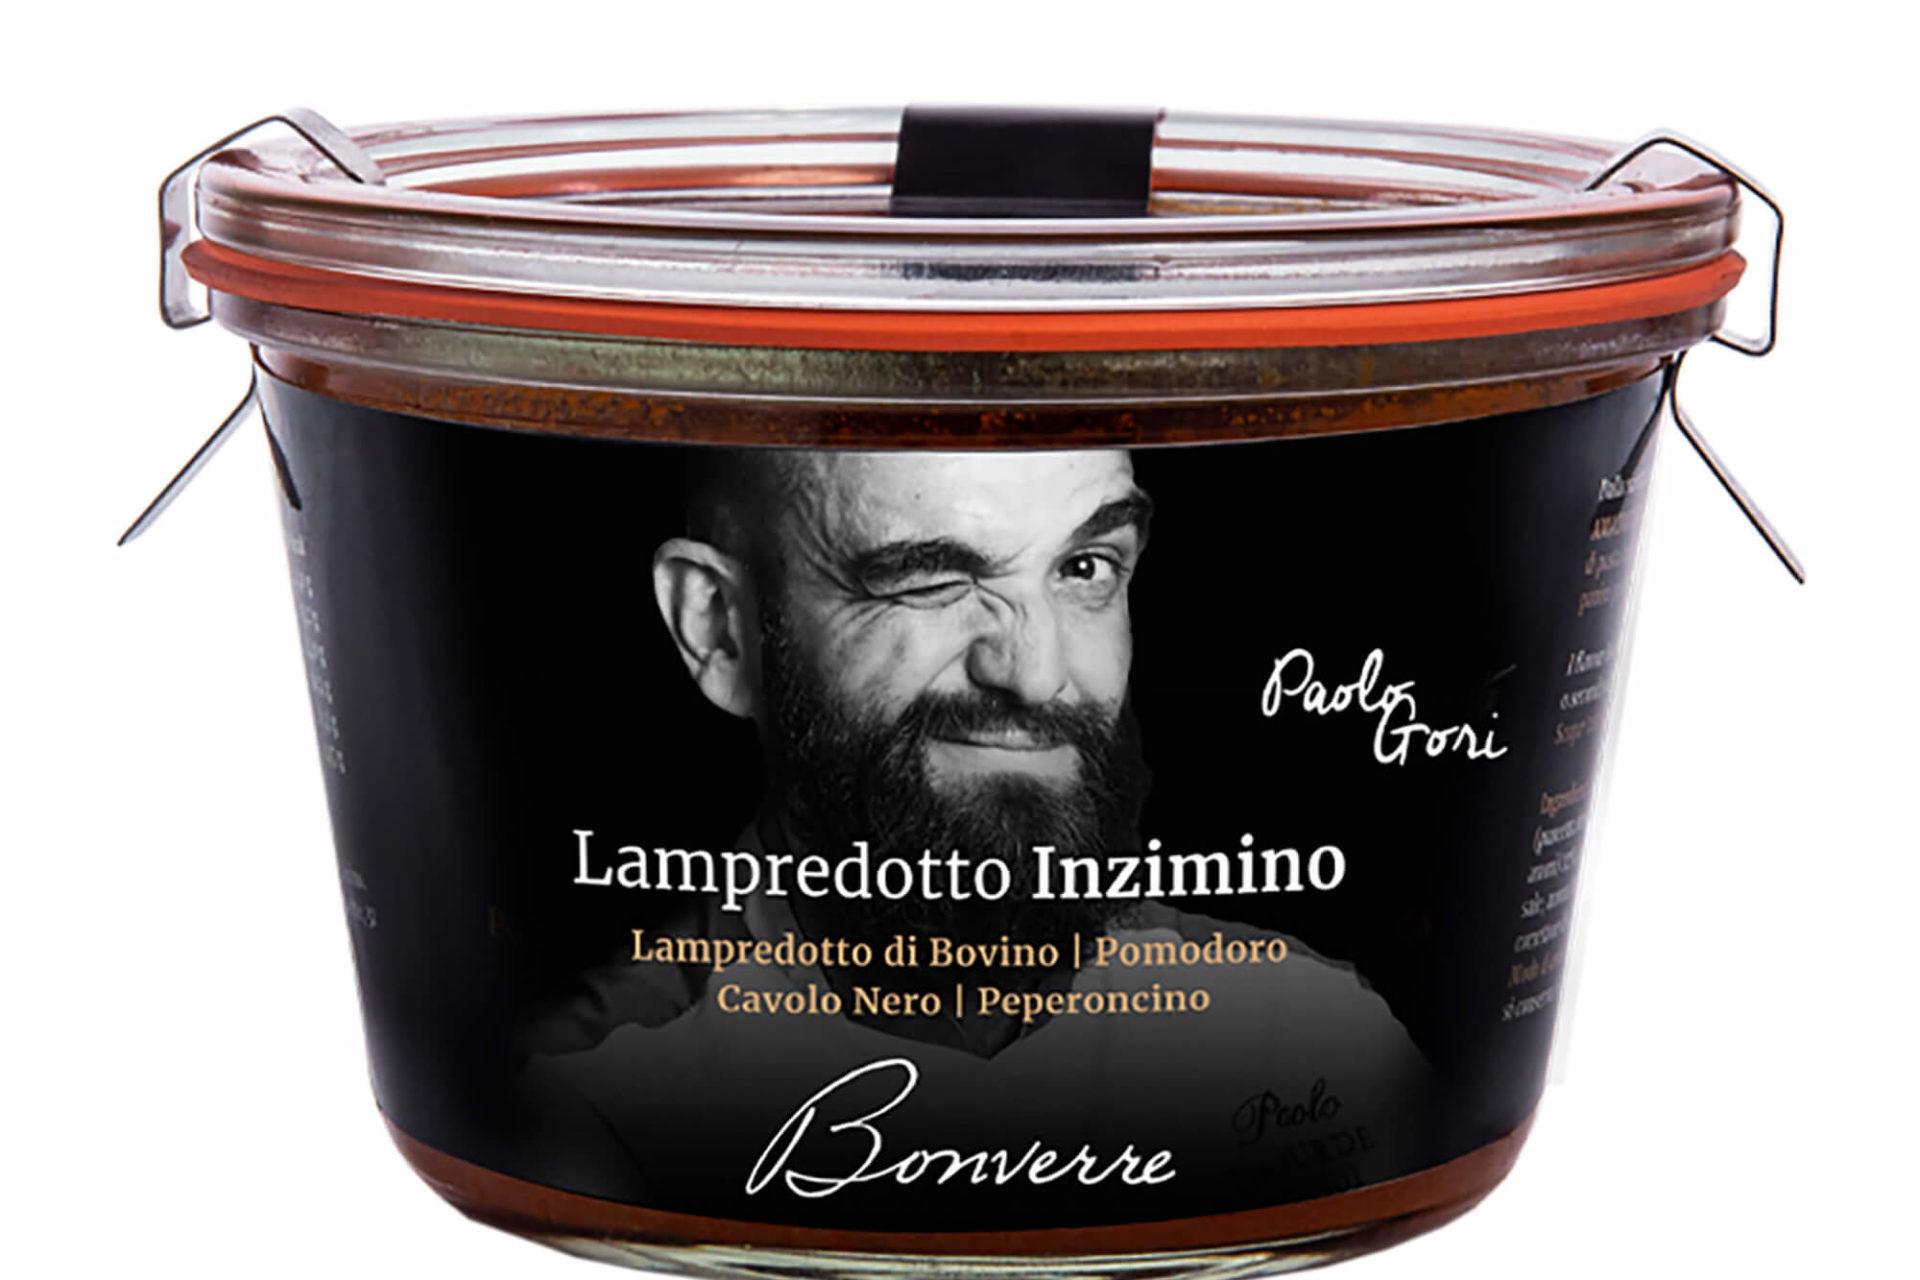 Paolo_Gori_Lampredotto_Inzimino